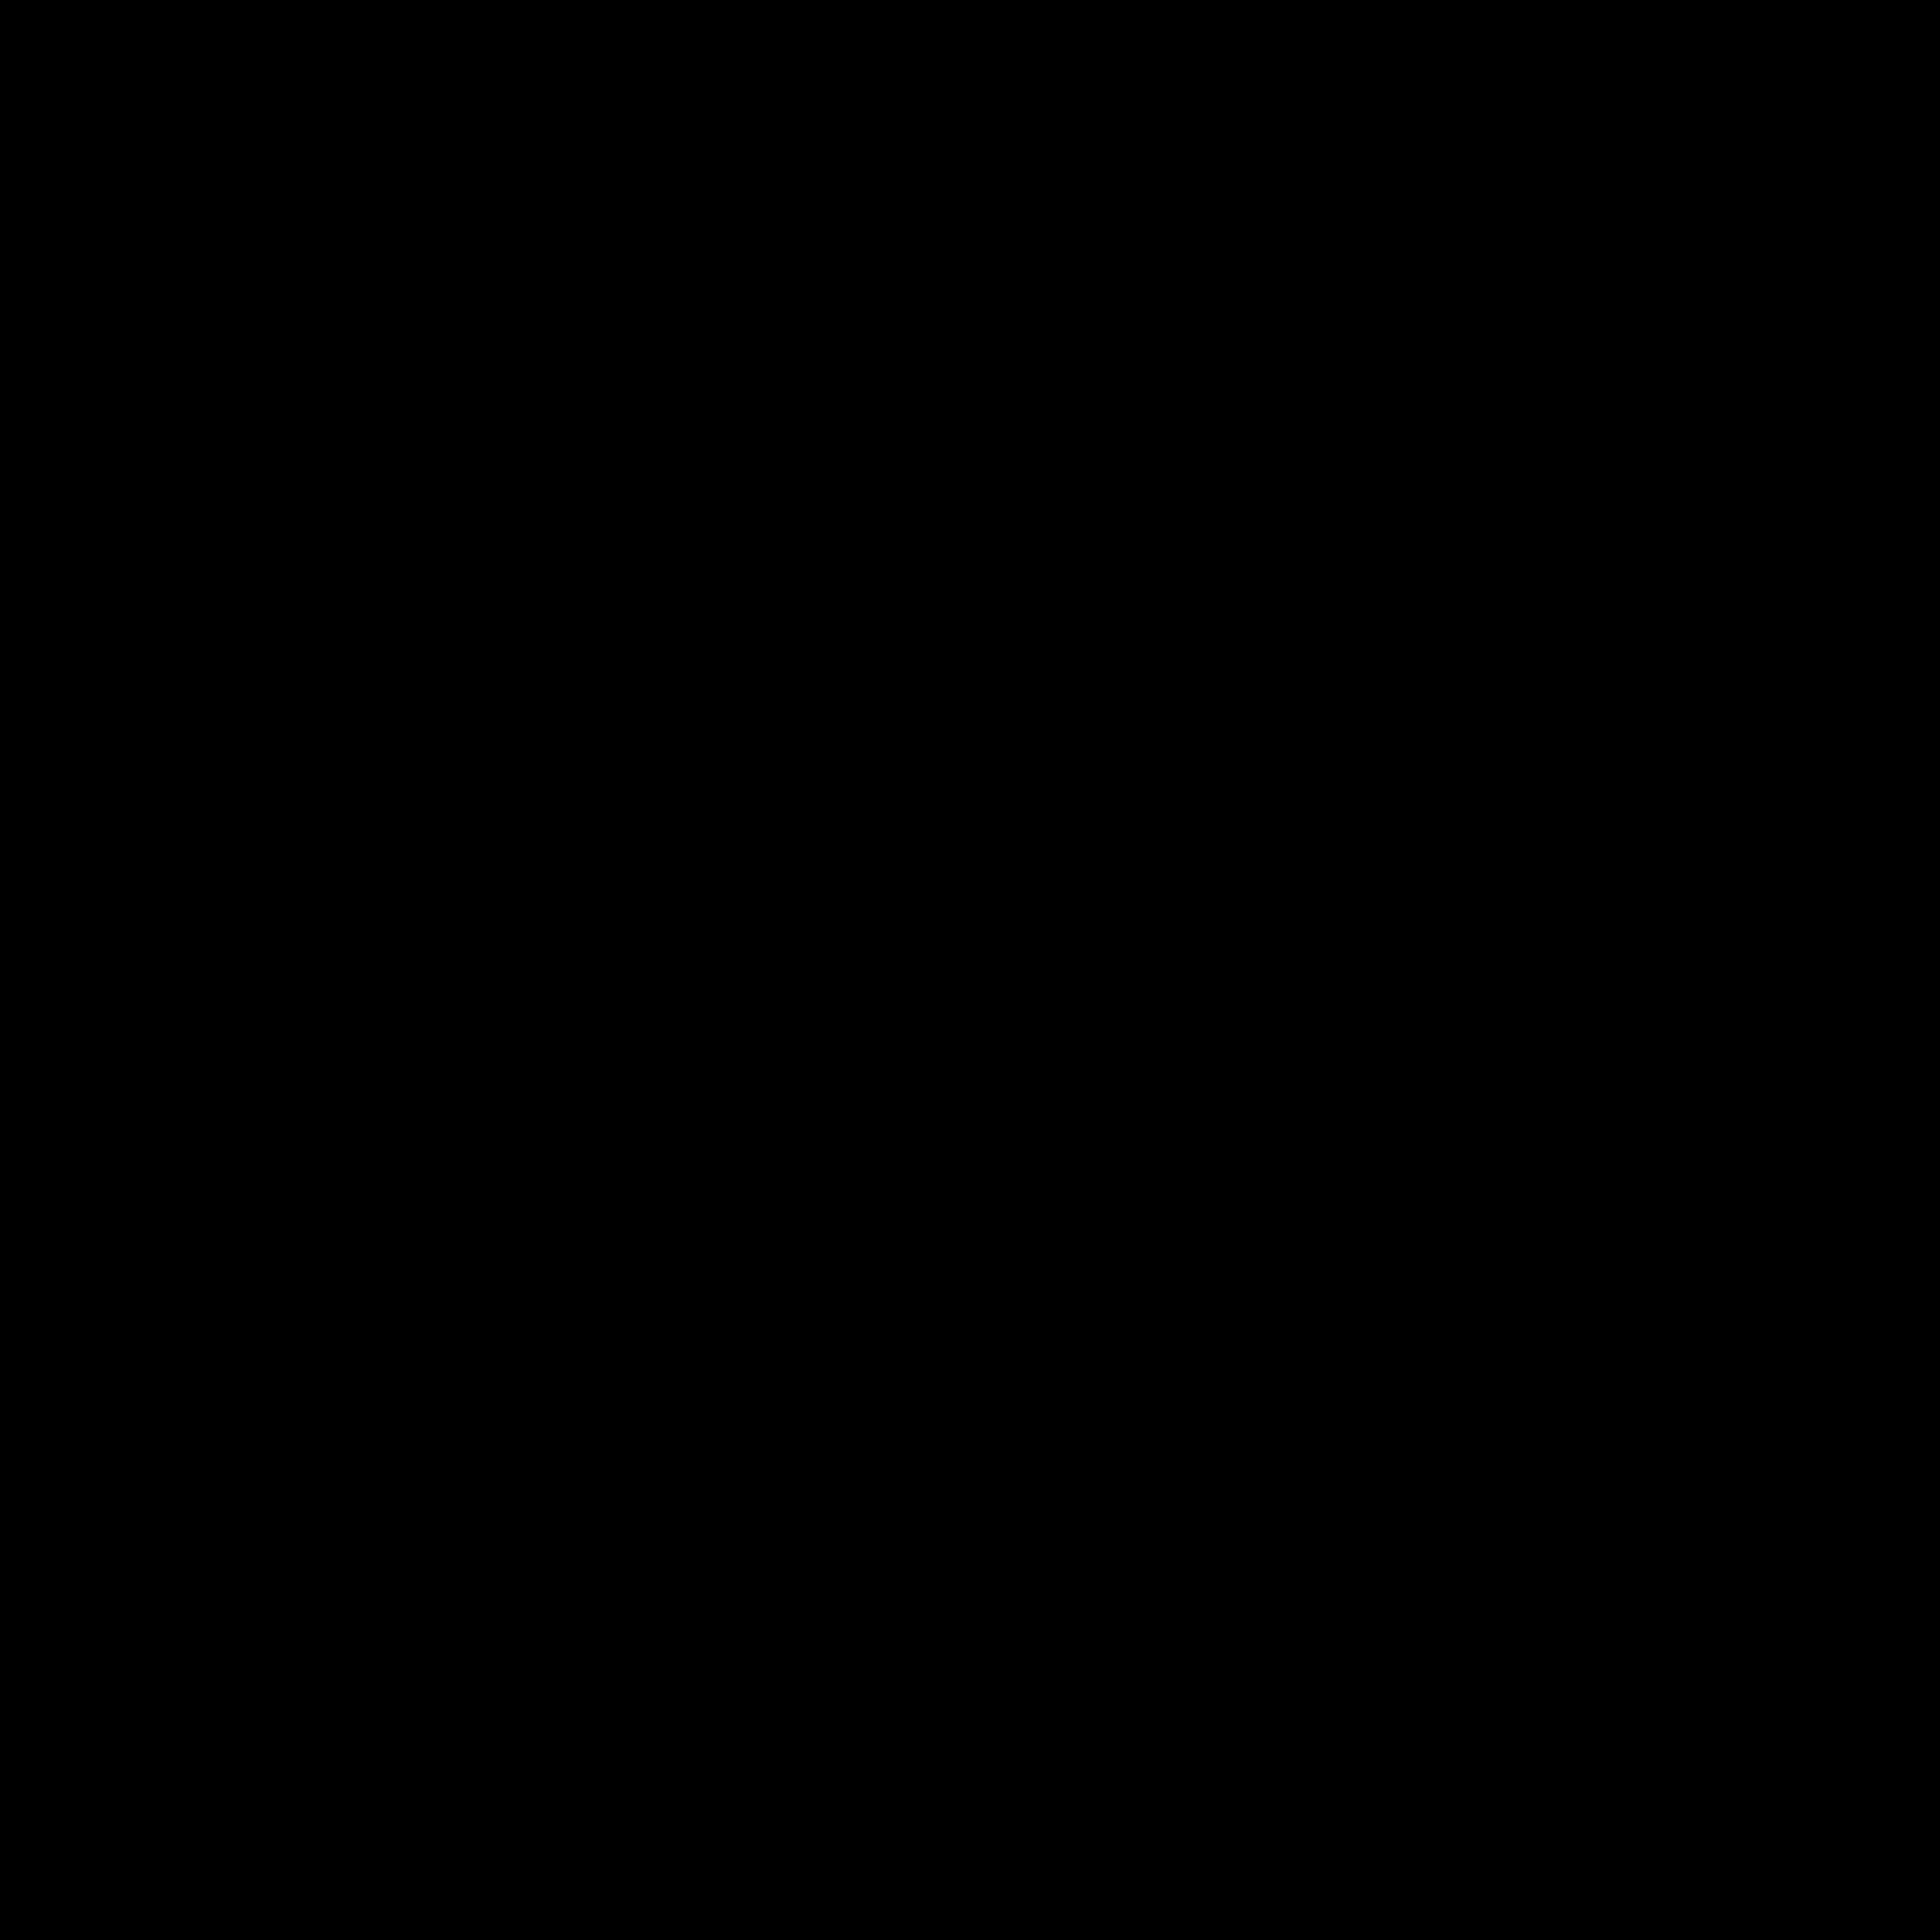 Analyse-Symbol